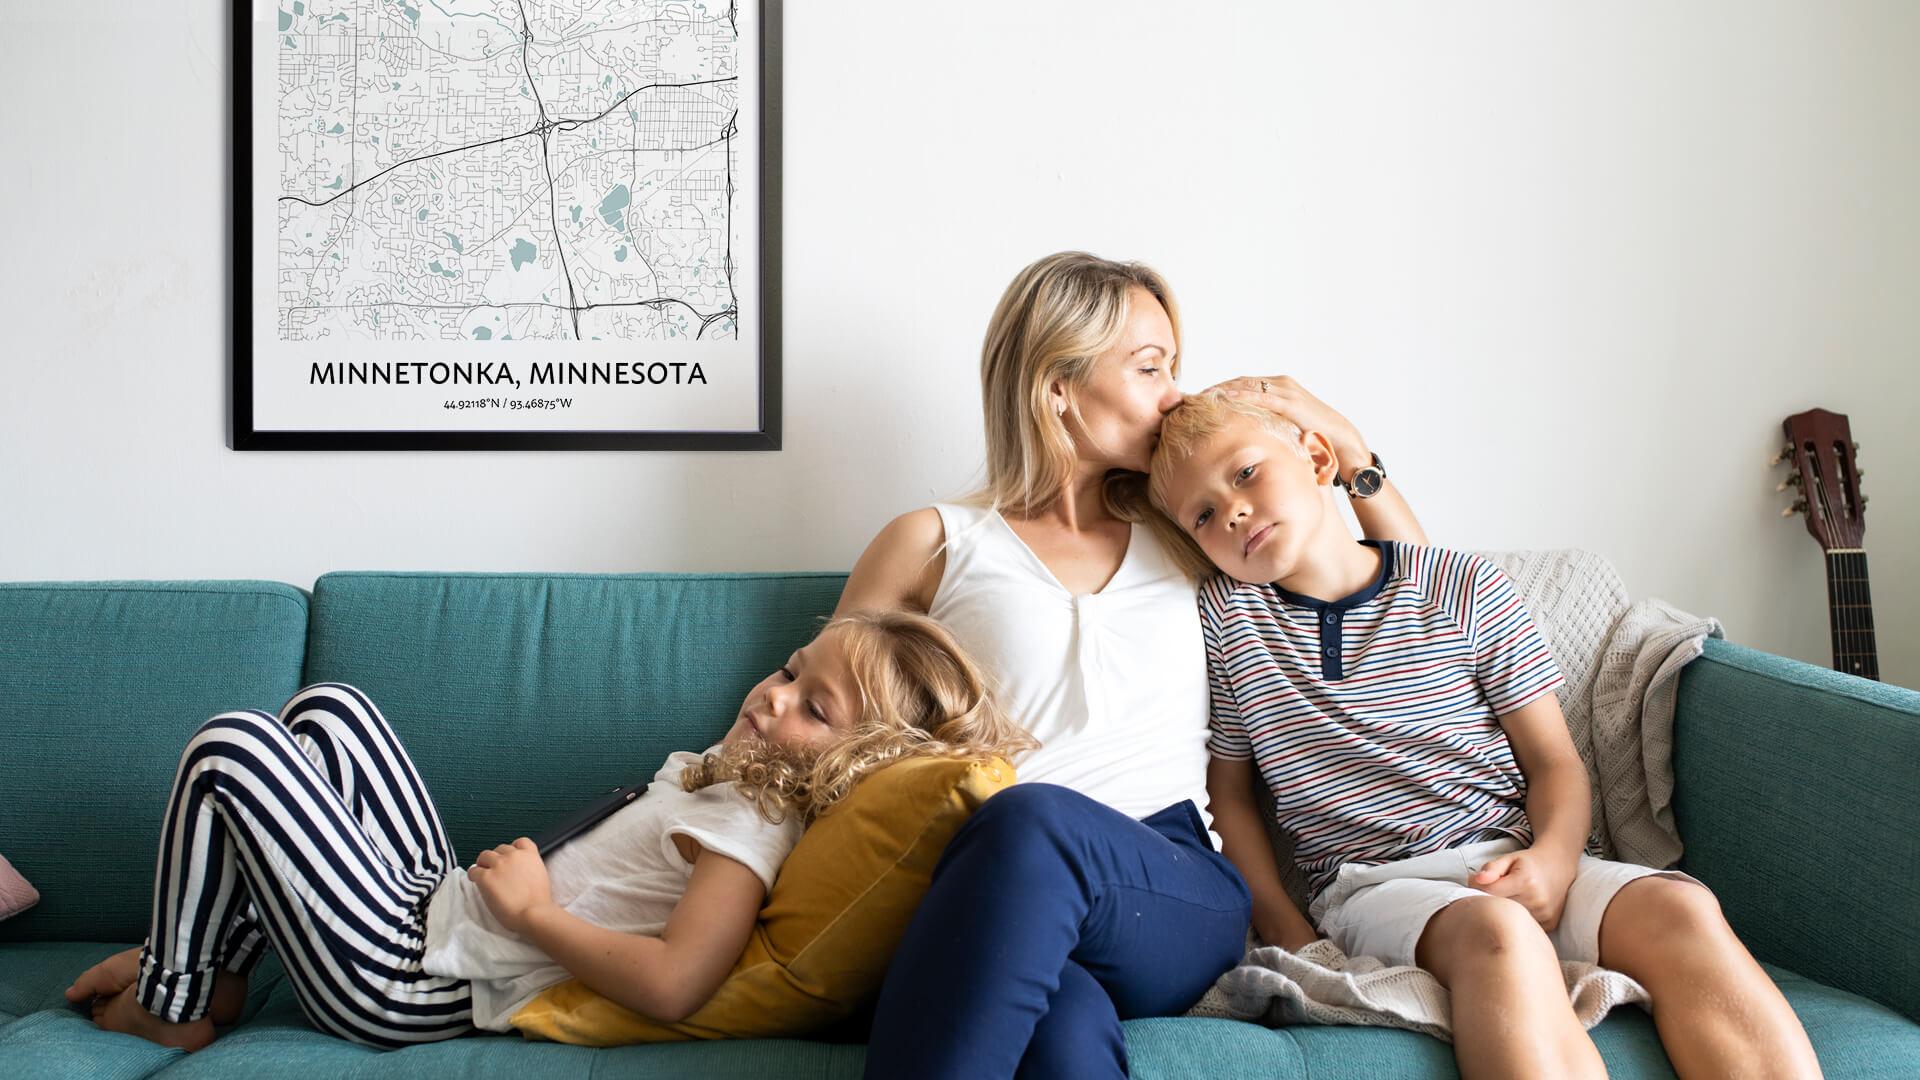 Minnetonka map poster